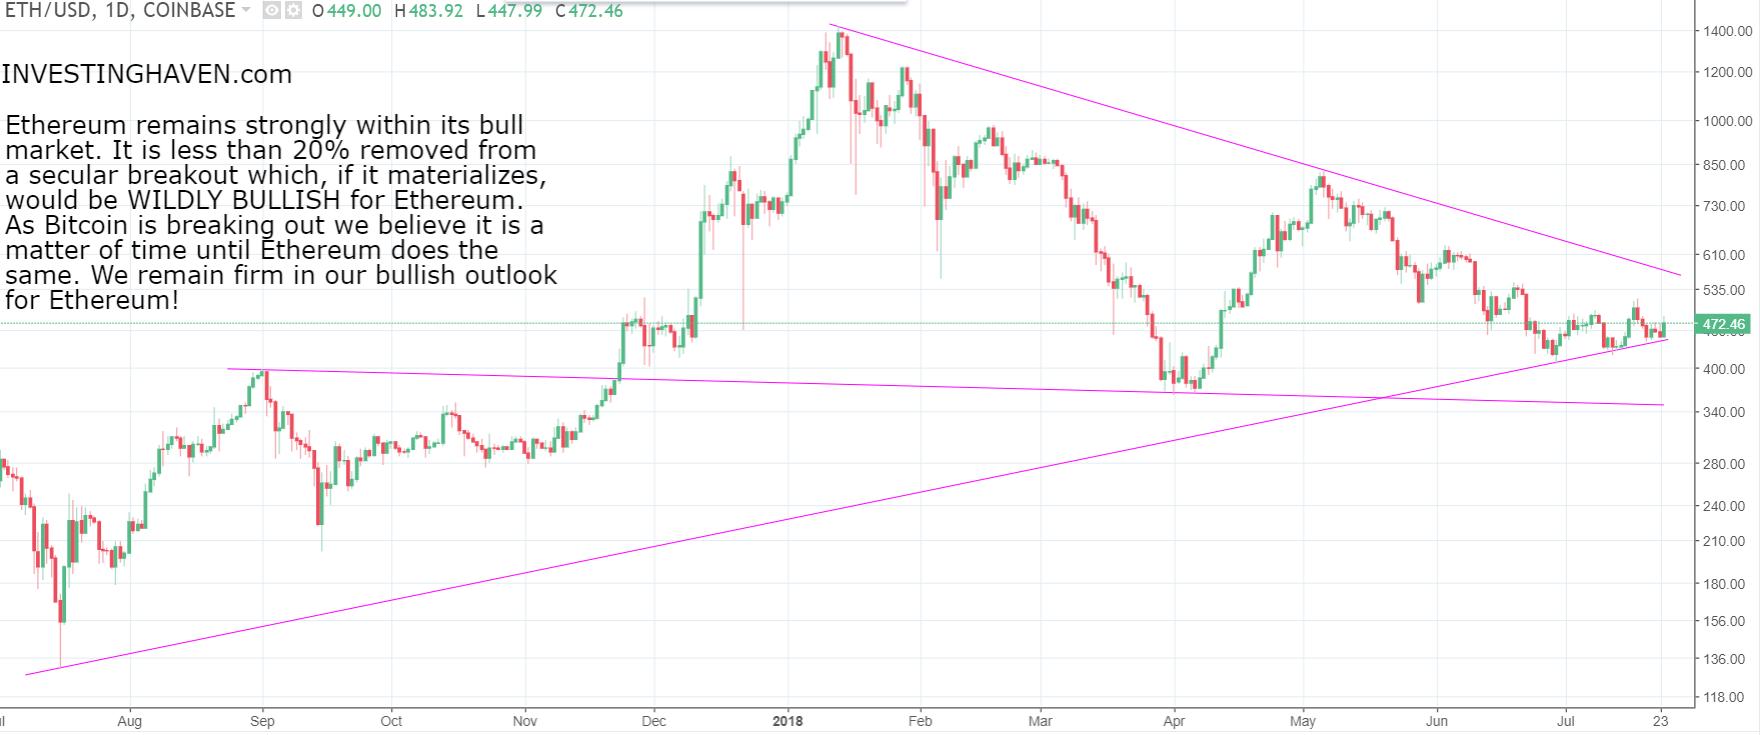 ethereum price bull market 2018